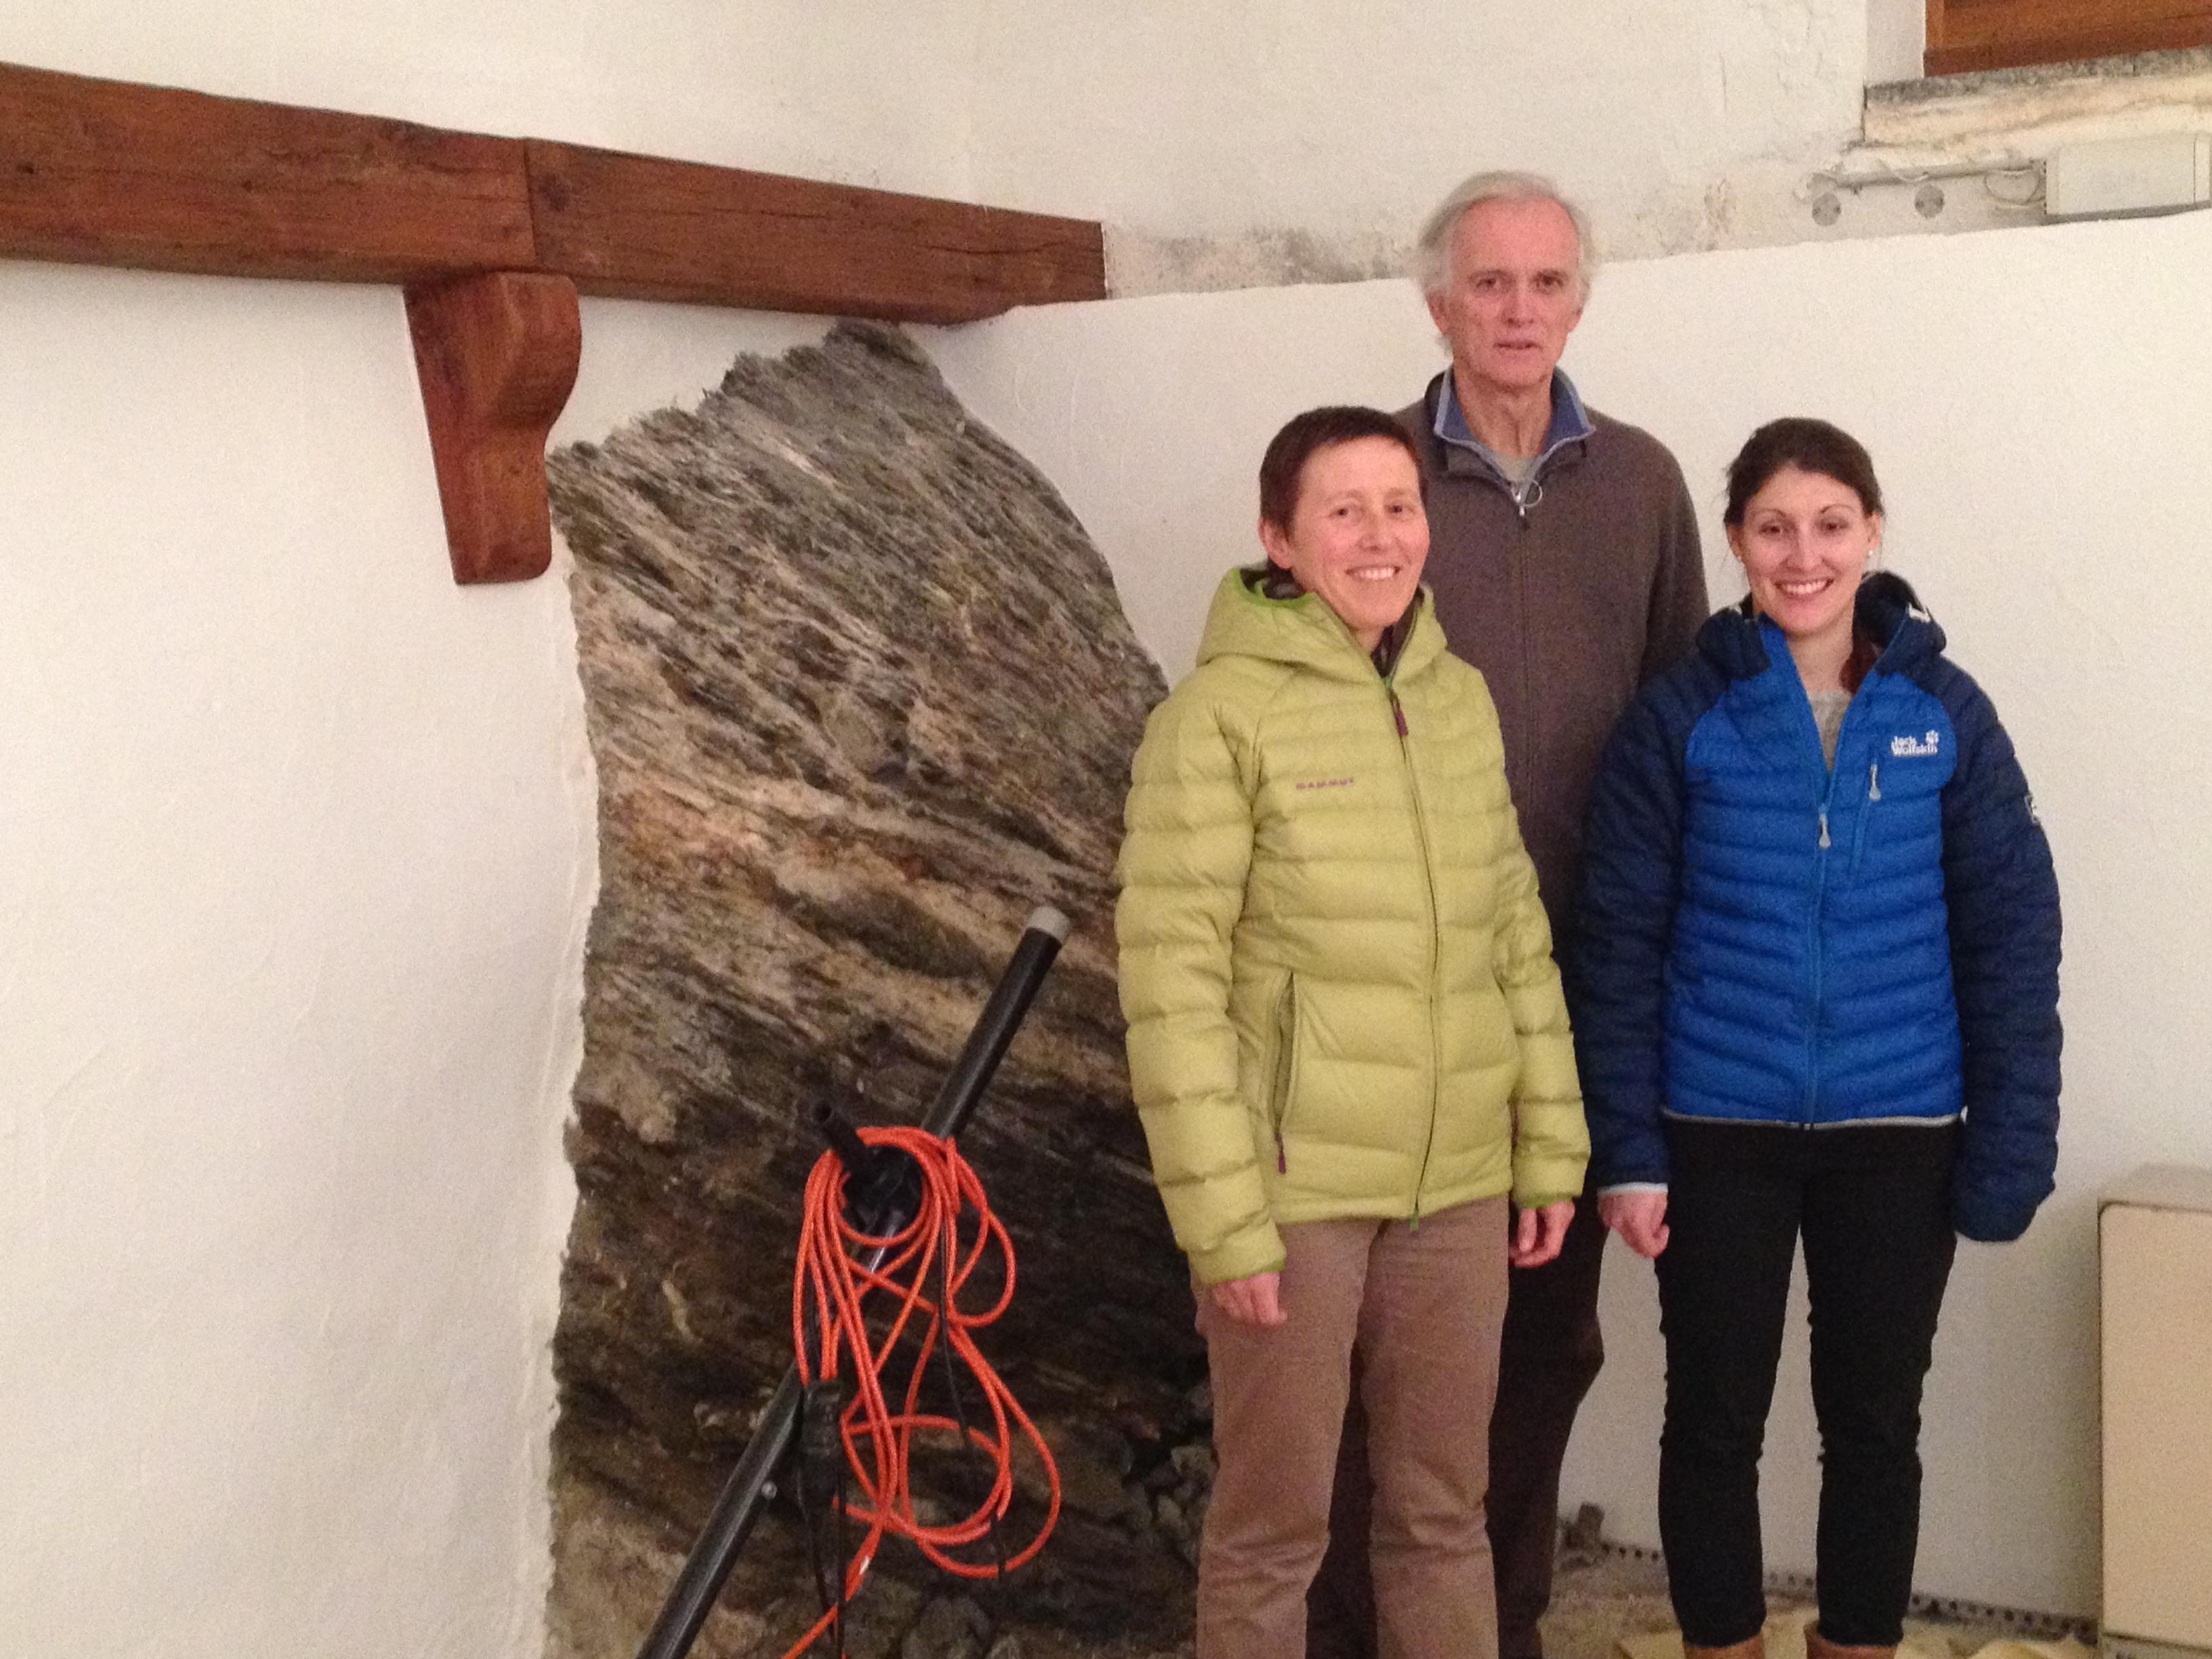 Bainbaud è tut pront: Gianna Bettina Gritti, Nicola Deichmann e Nataglia Caviezel s'allegran sin la reavertura da la Grotta da Cultura en las novas localitads a Sent.